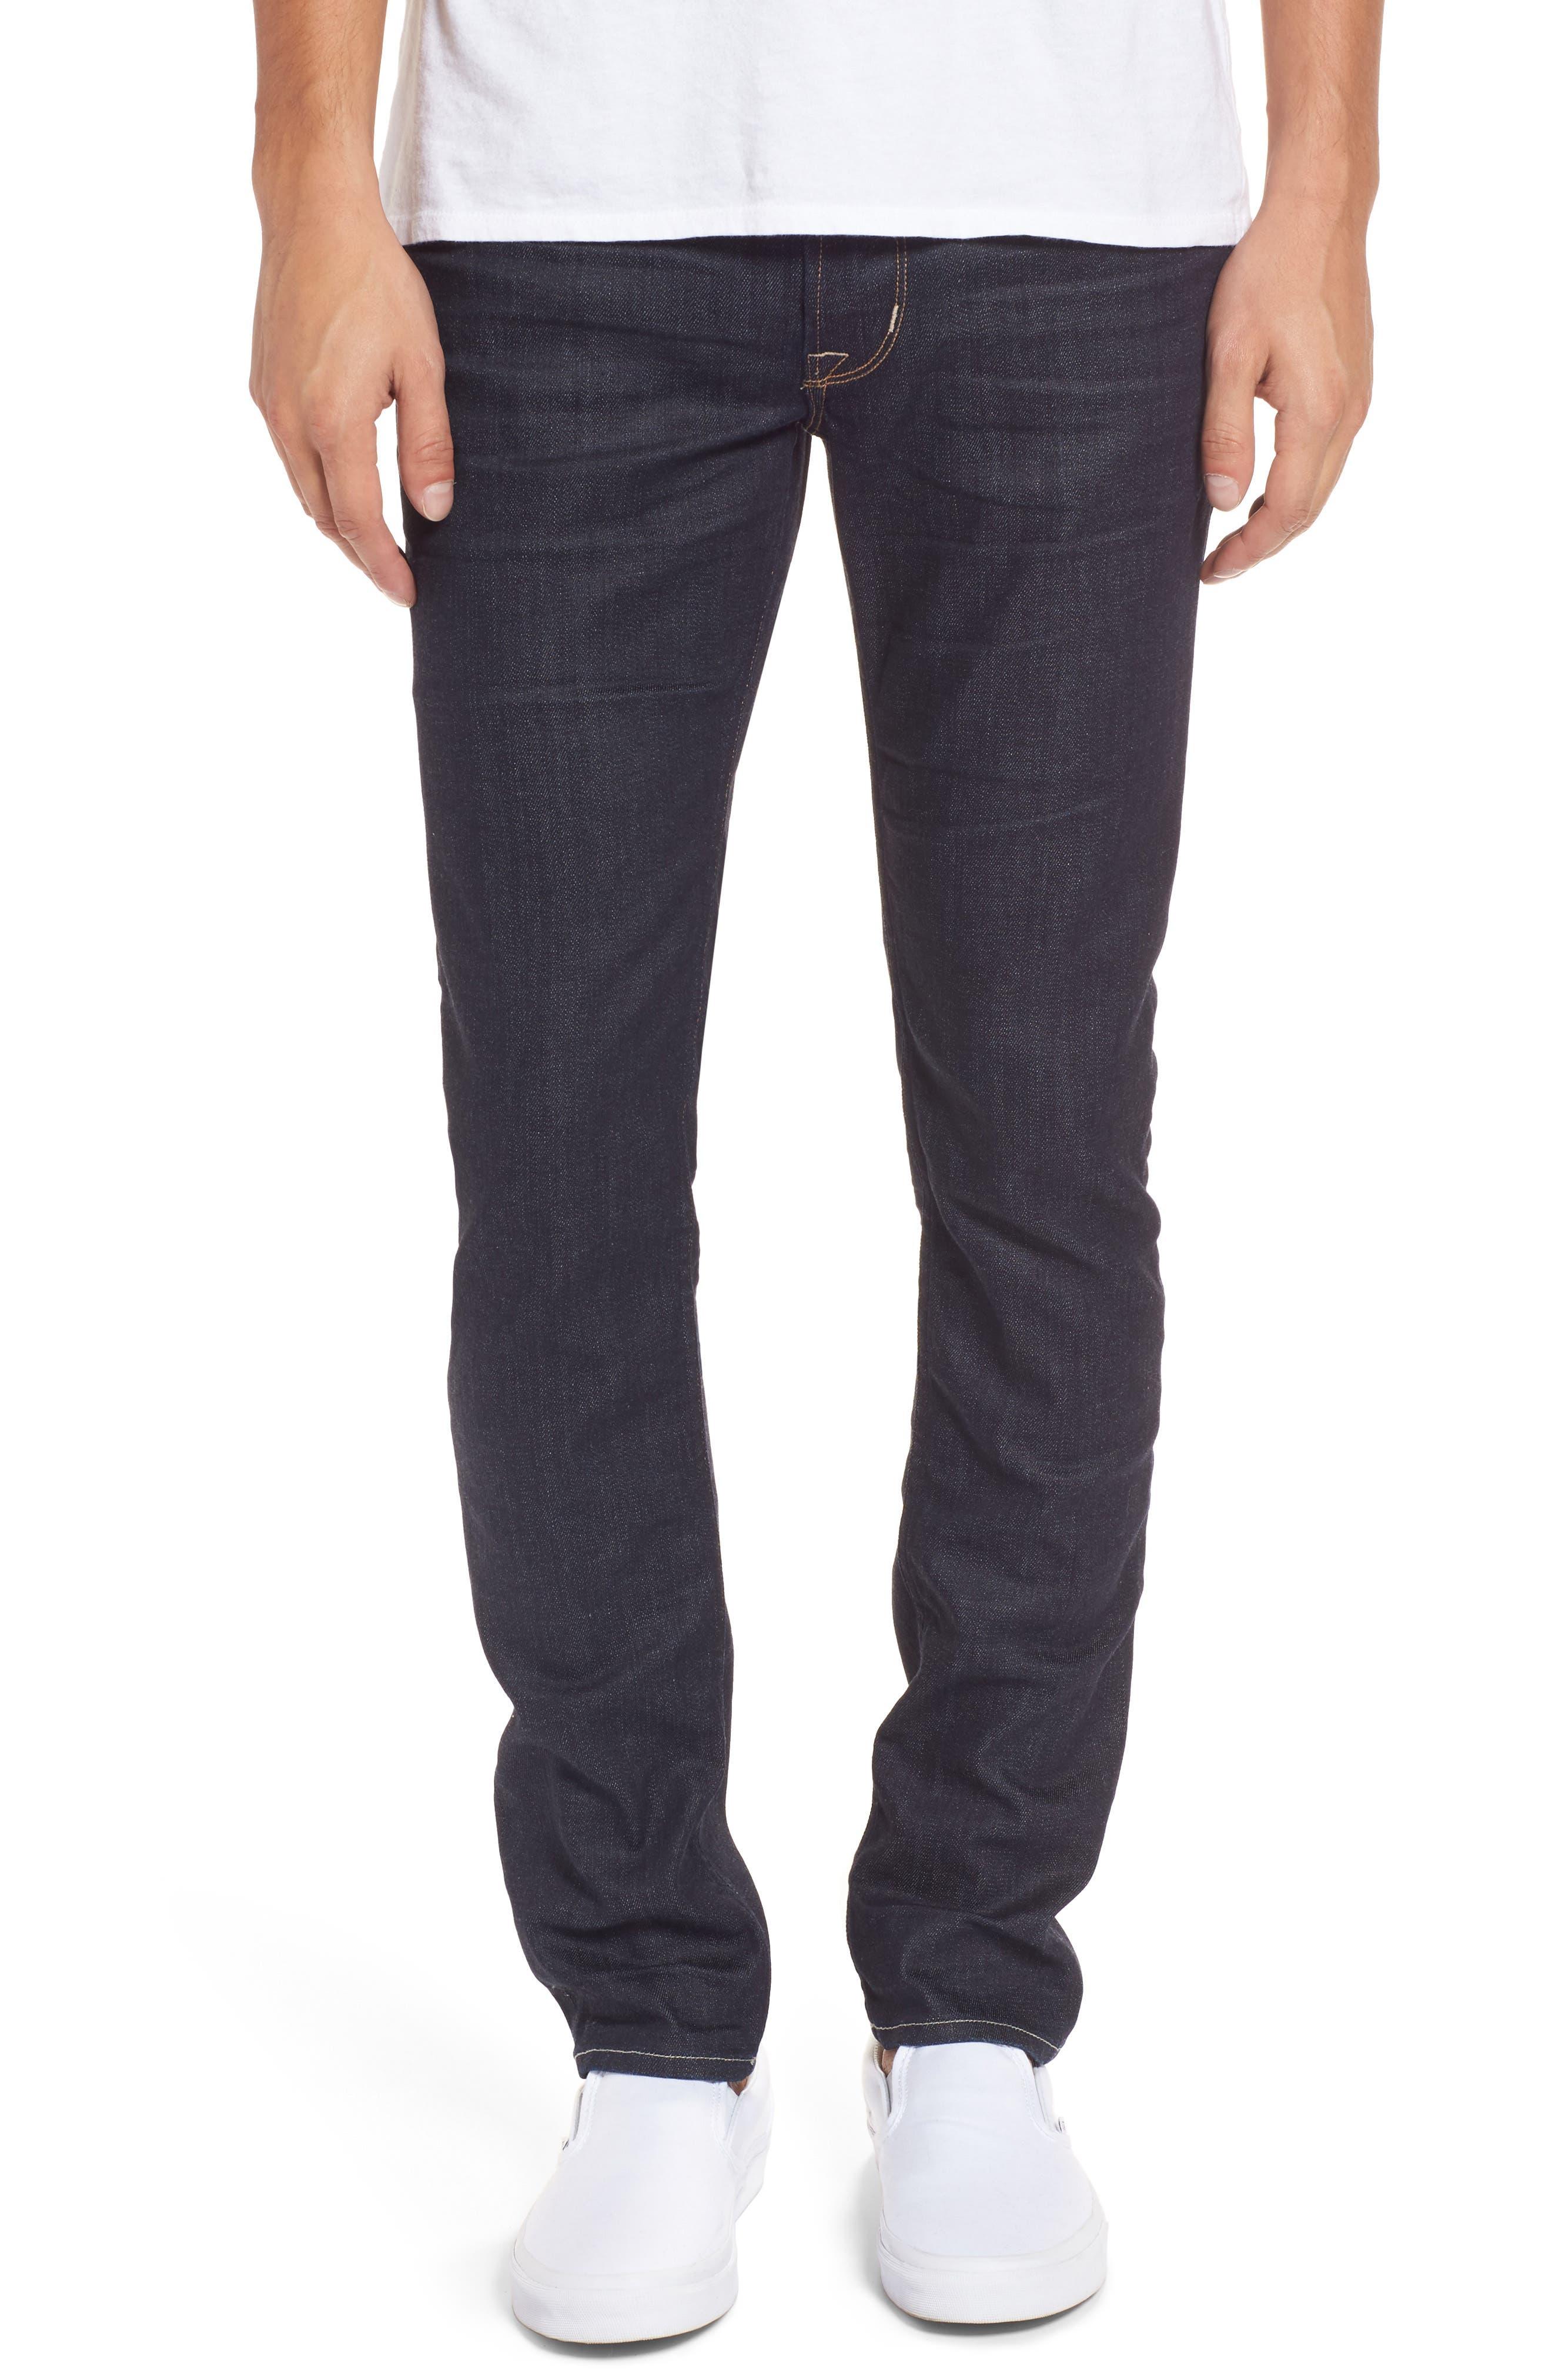 Hudson Axl Skinny Fit Jeans by Hudson Jeans